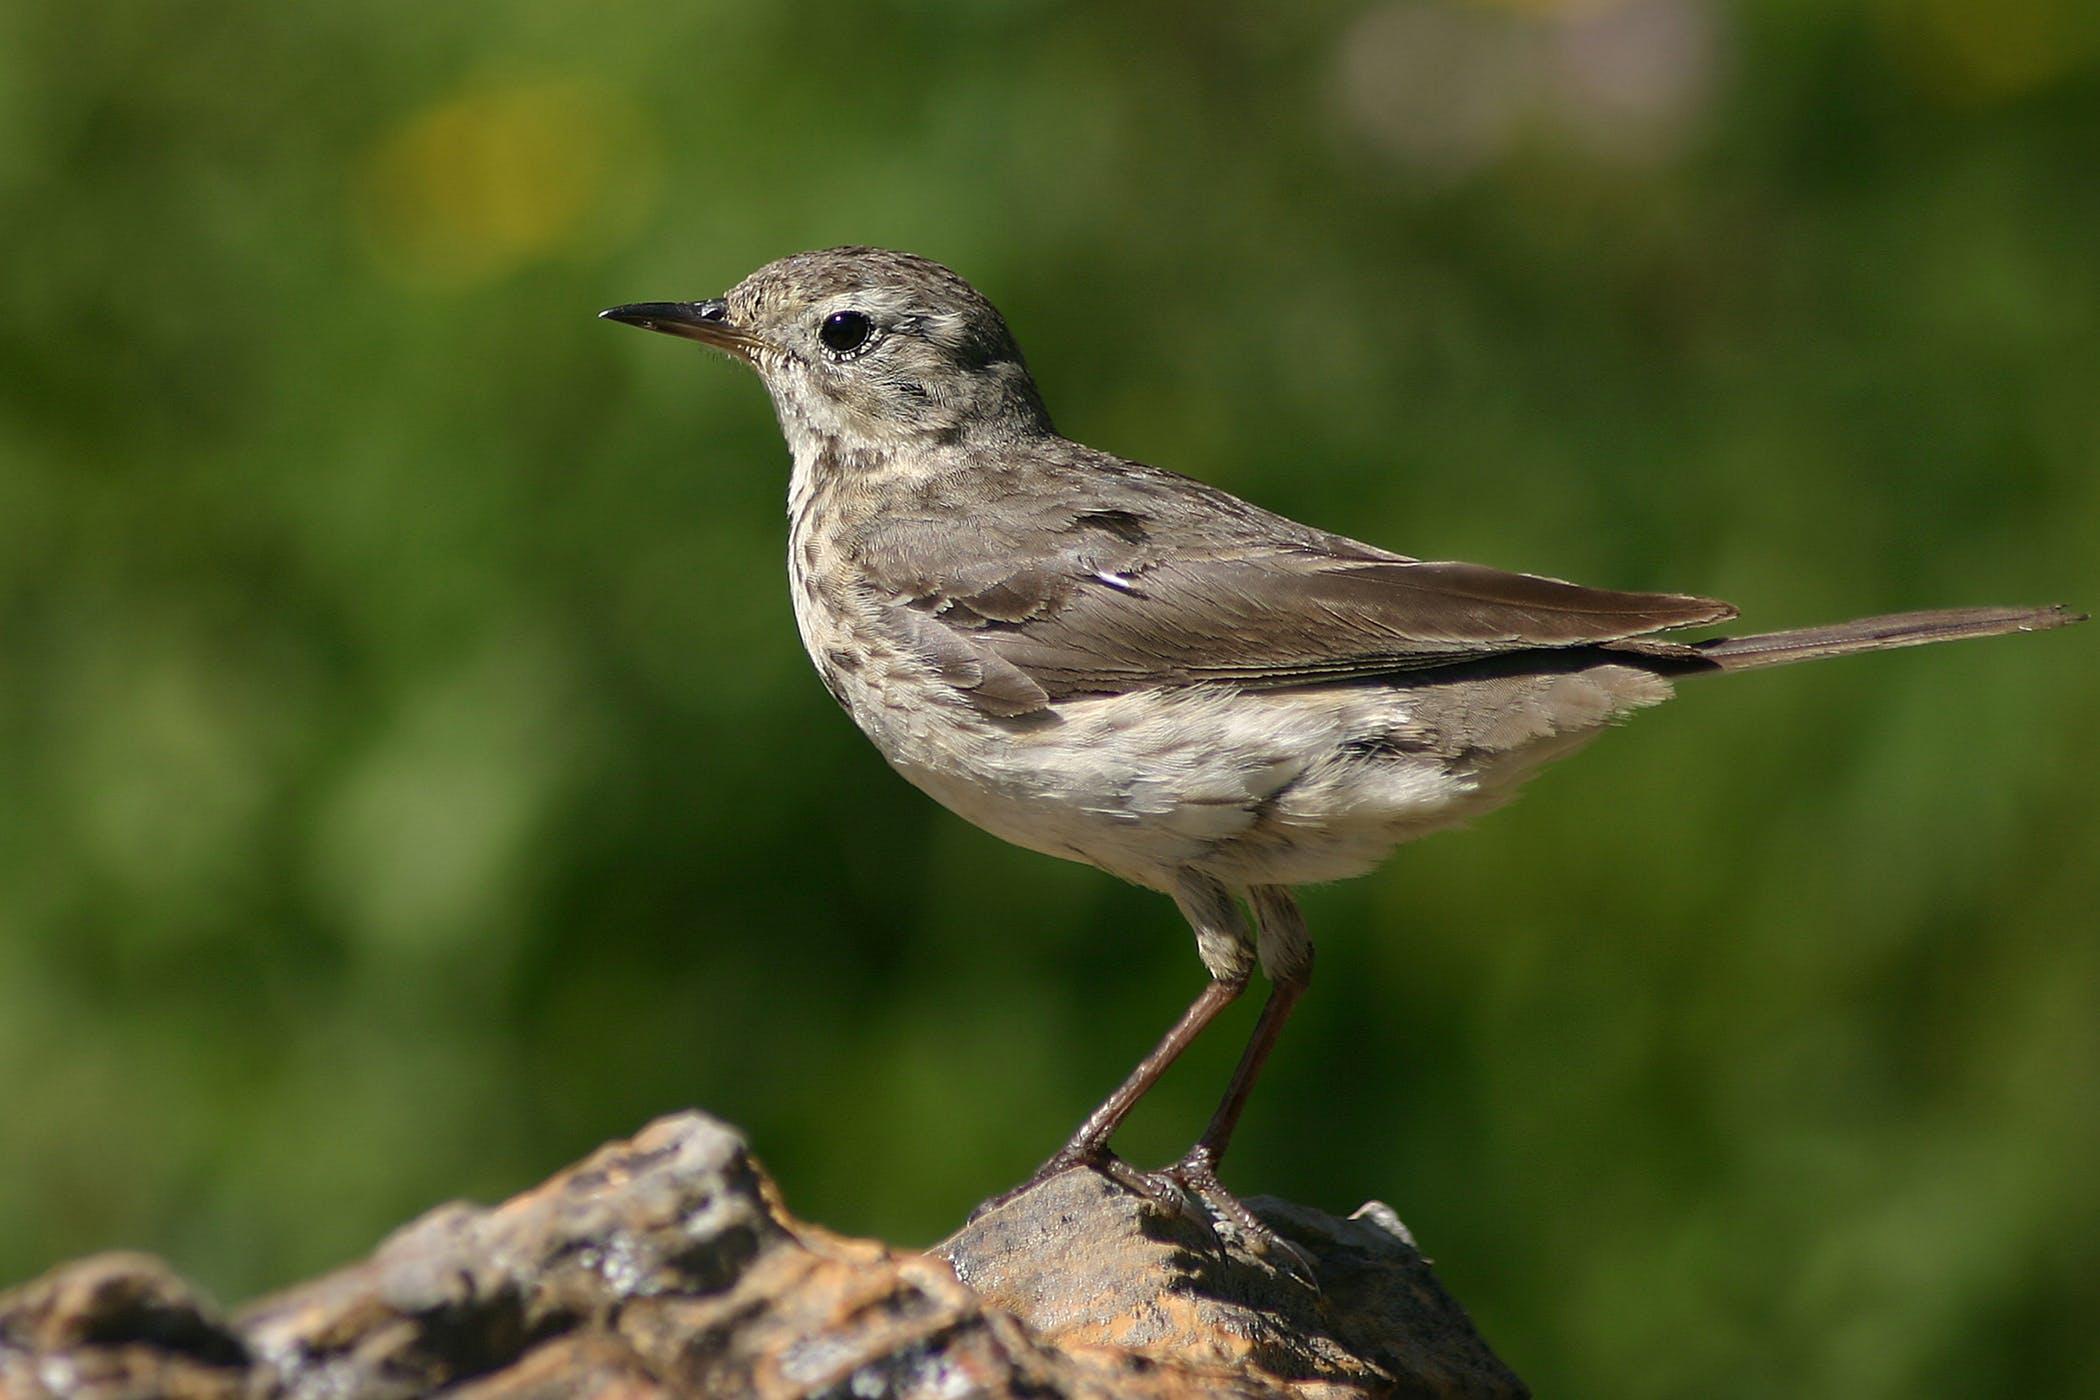 Musculoskeletal Neoplasms in Birds